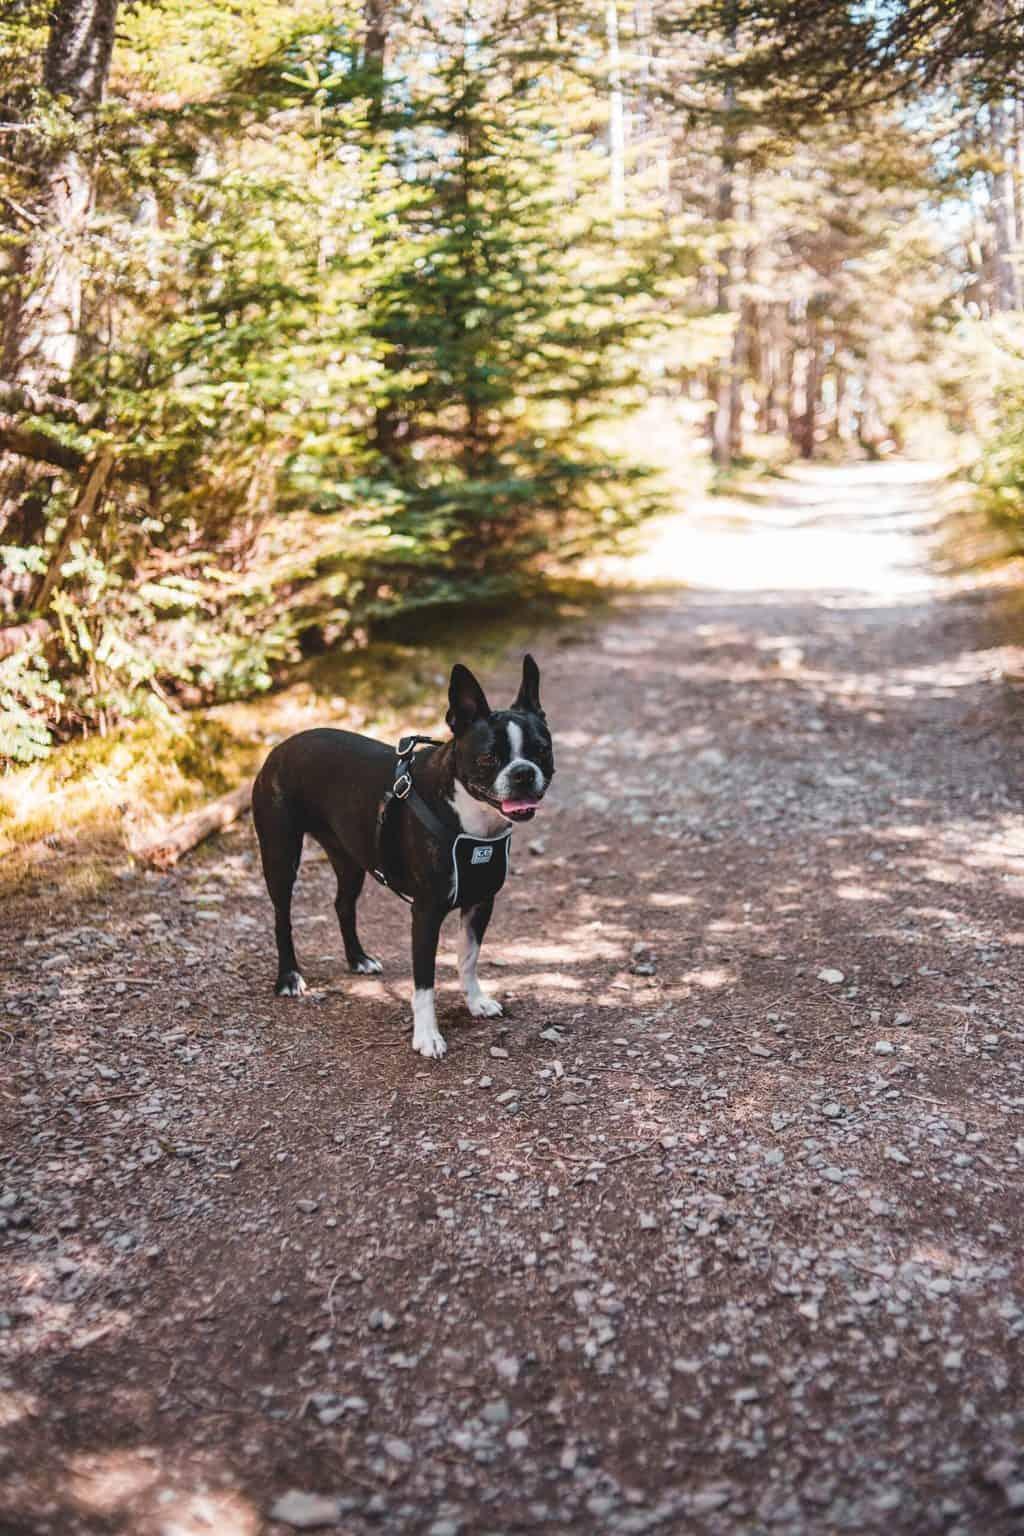 Boston terrier dog wearing a harness